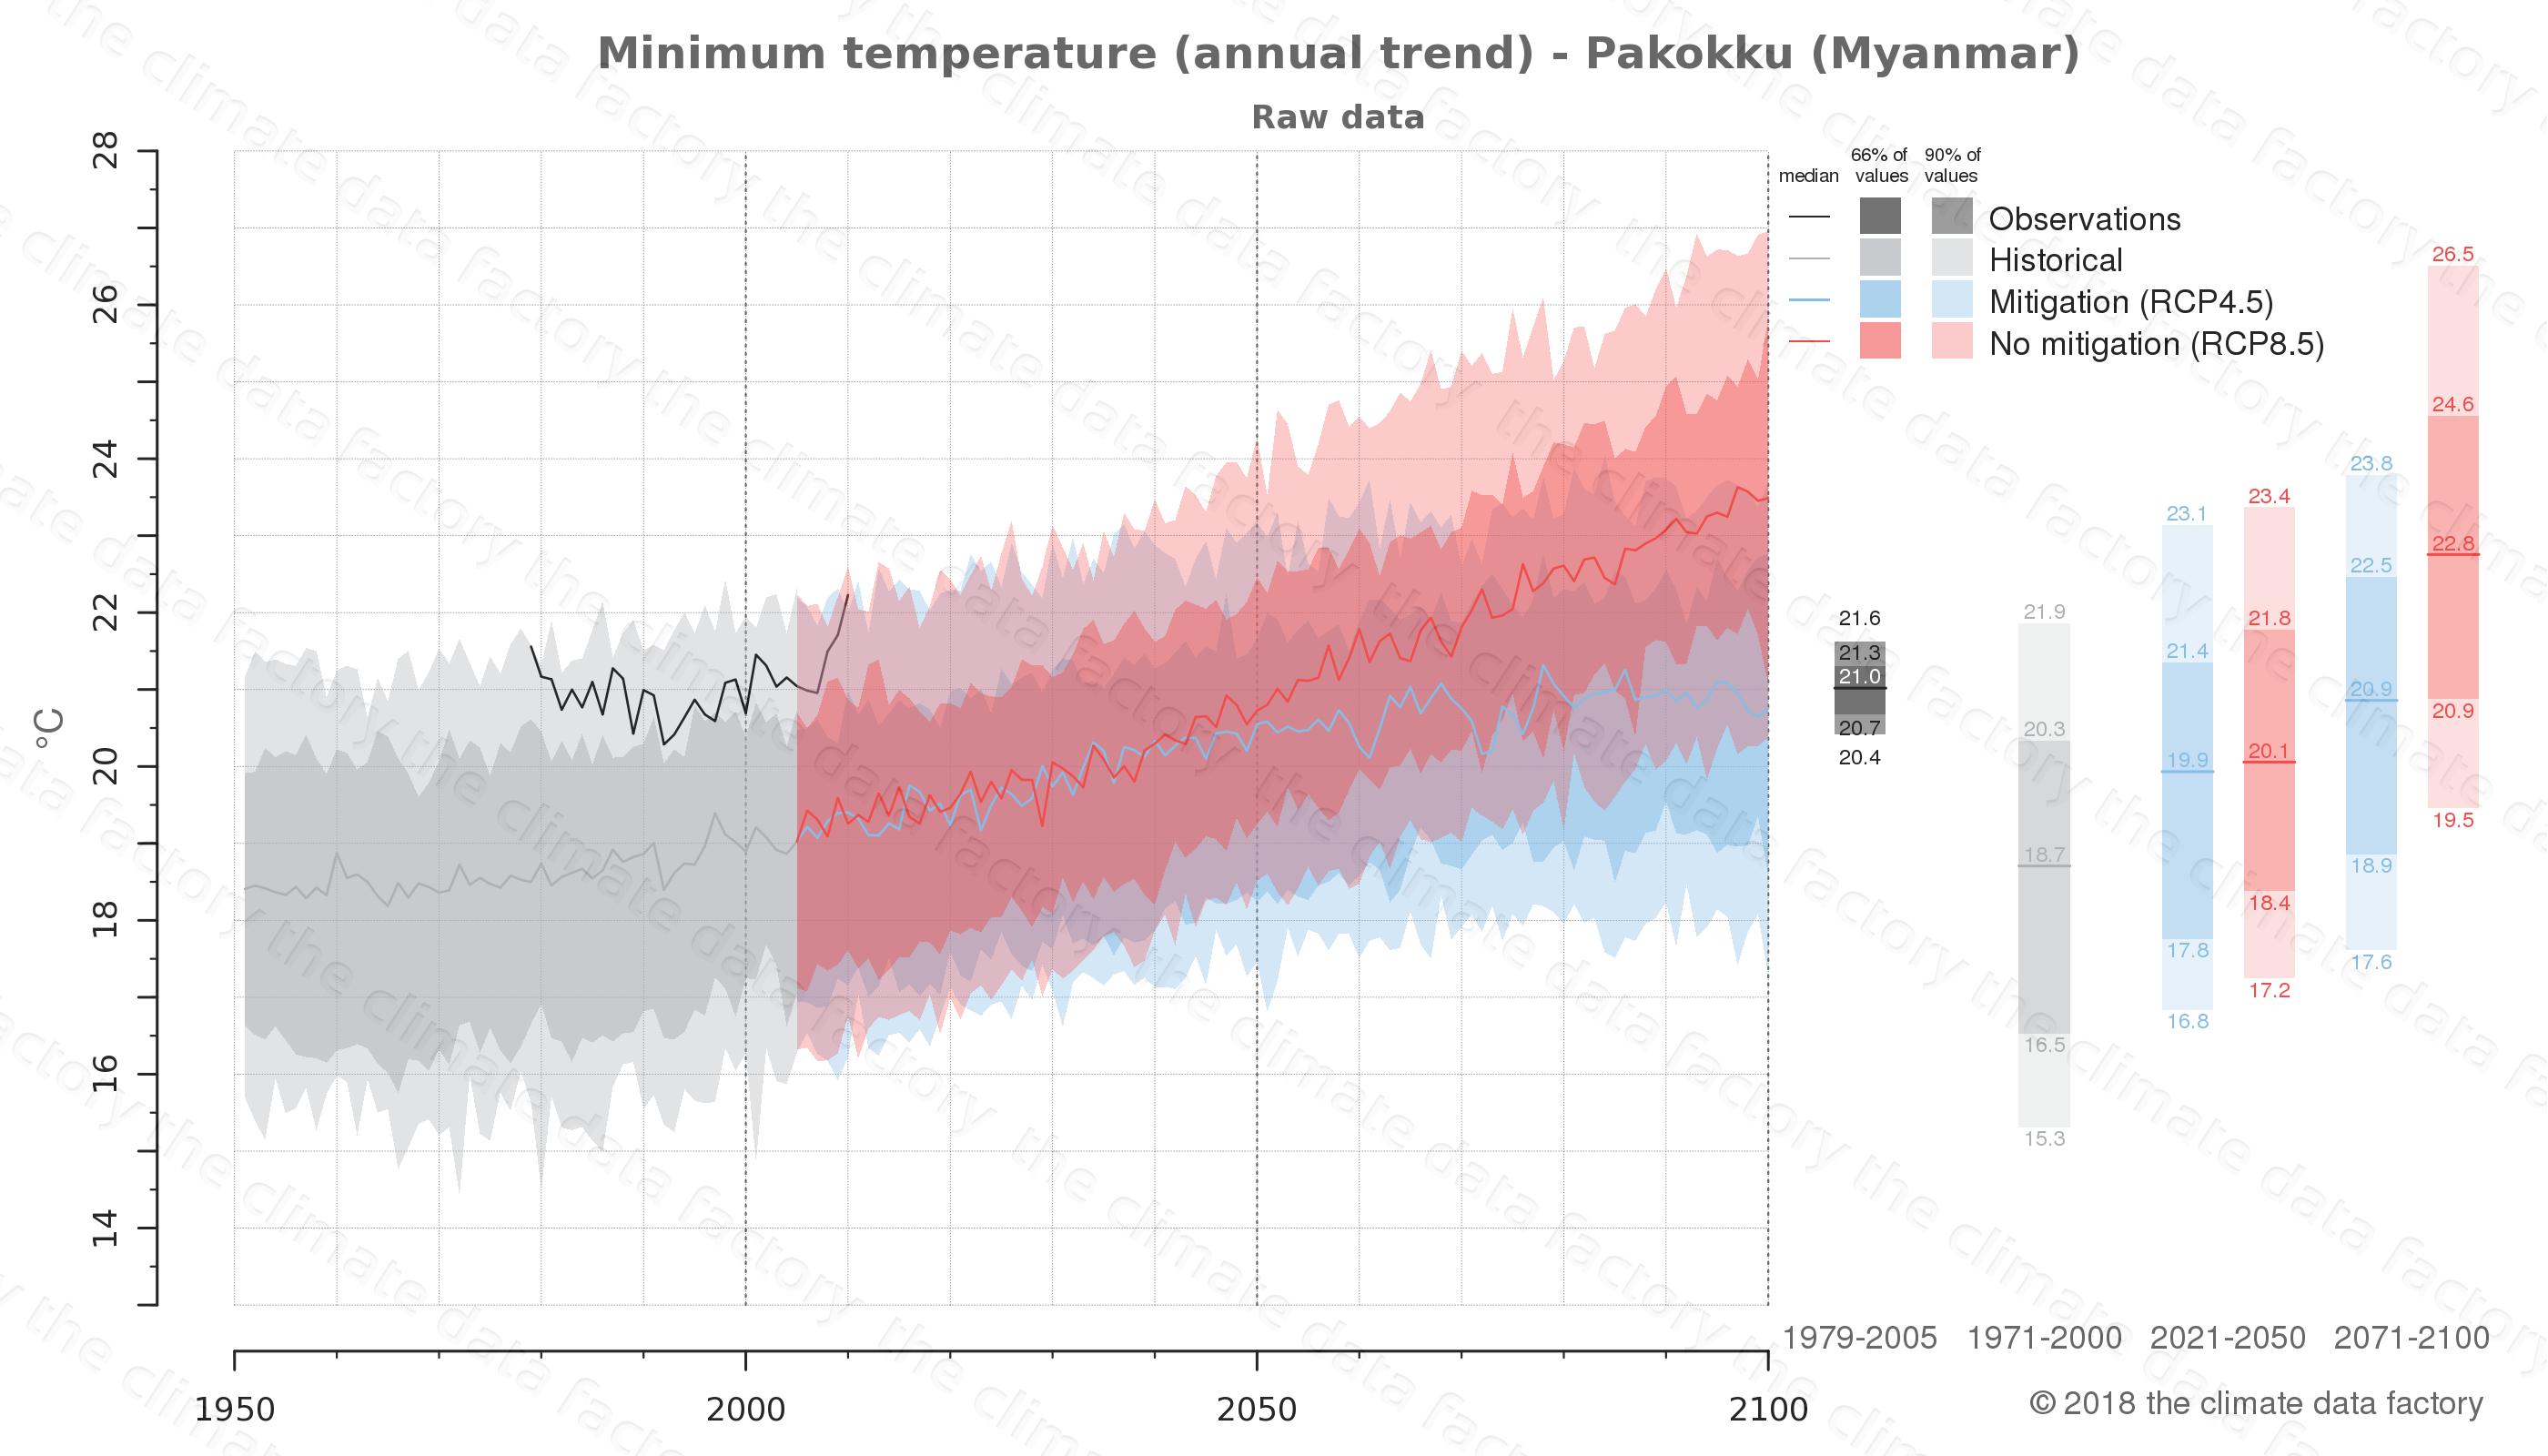 climate change data policy adaptation climate graph city data minimum-temperature pakokku myanmar